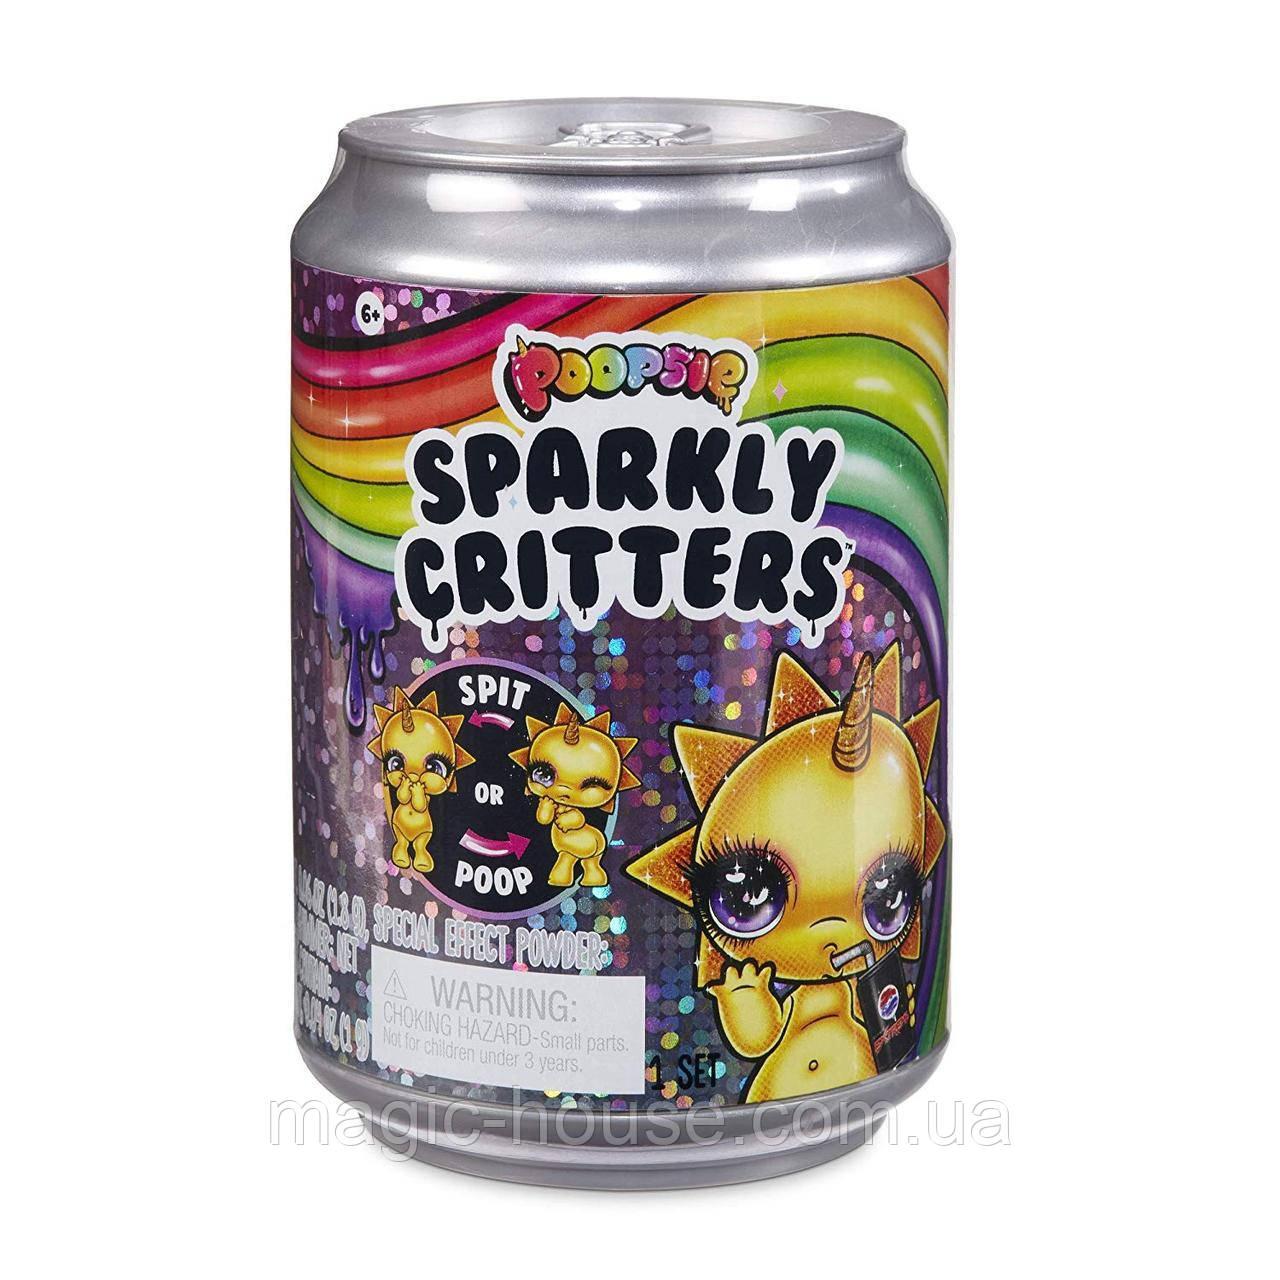 Оригинал! MGA Poopsie Сюрприз Sparkly Critters